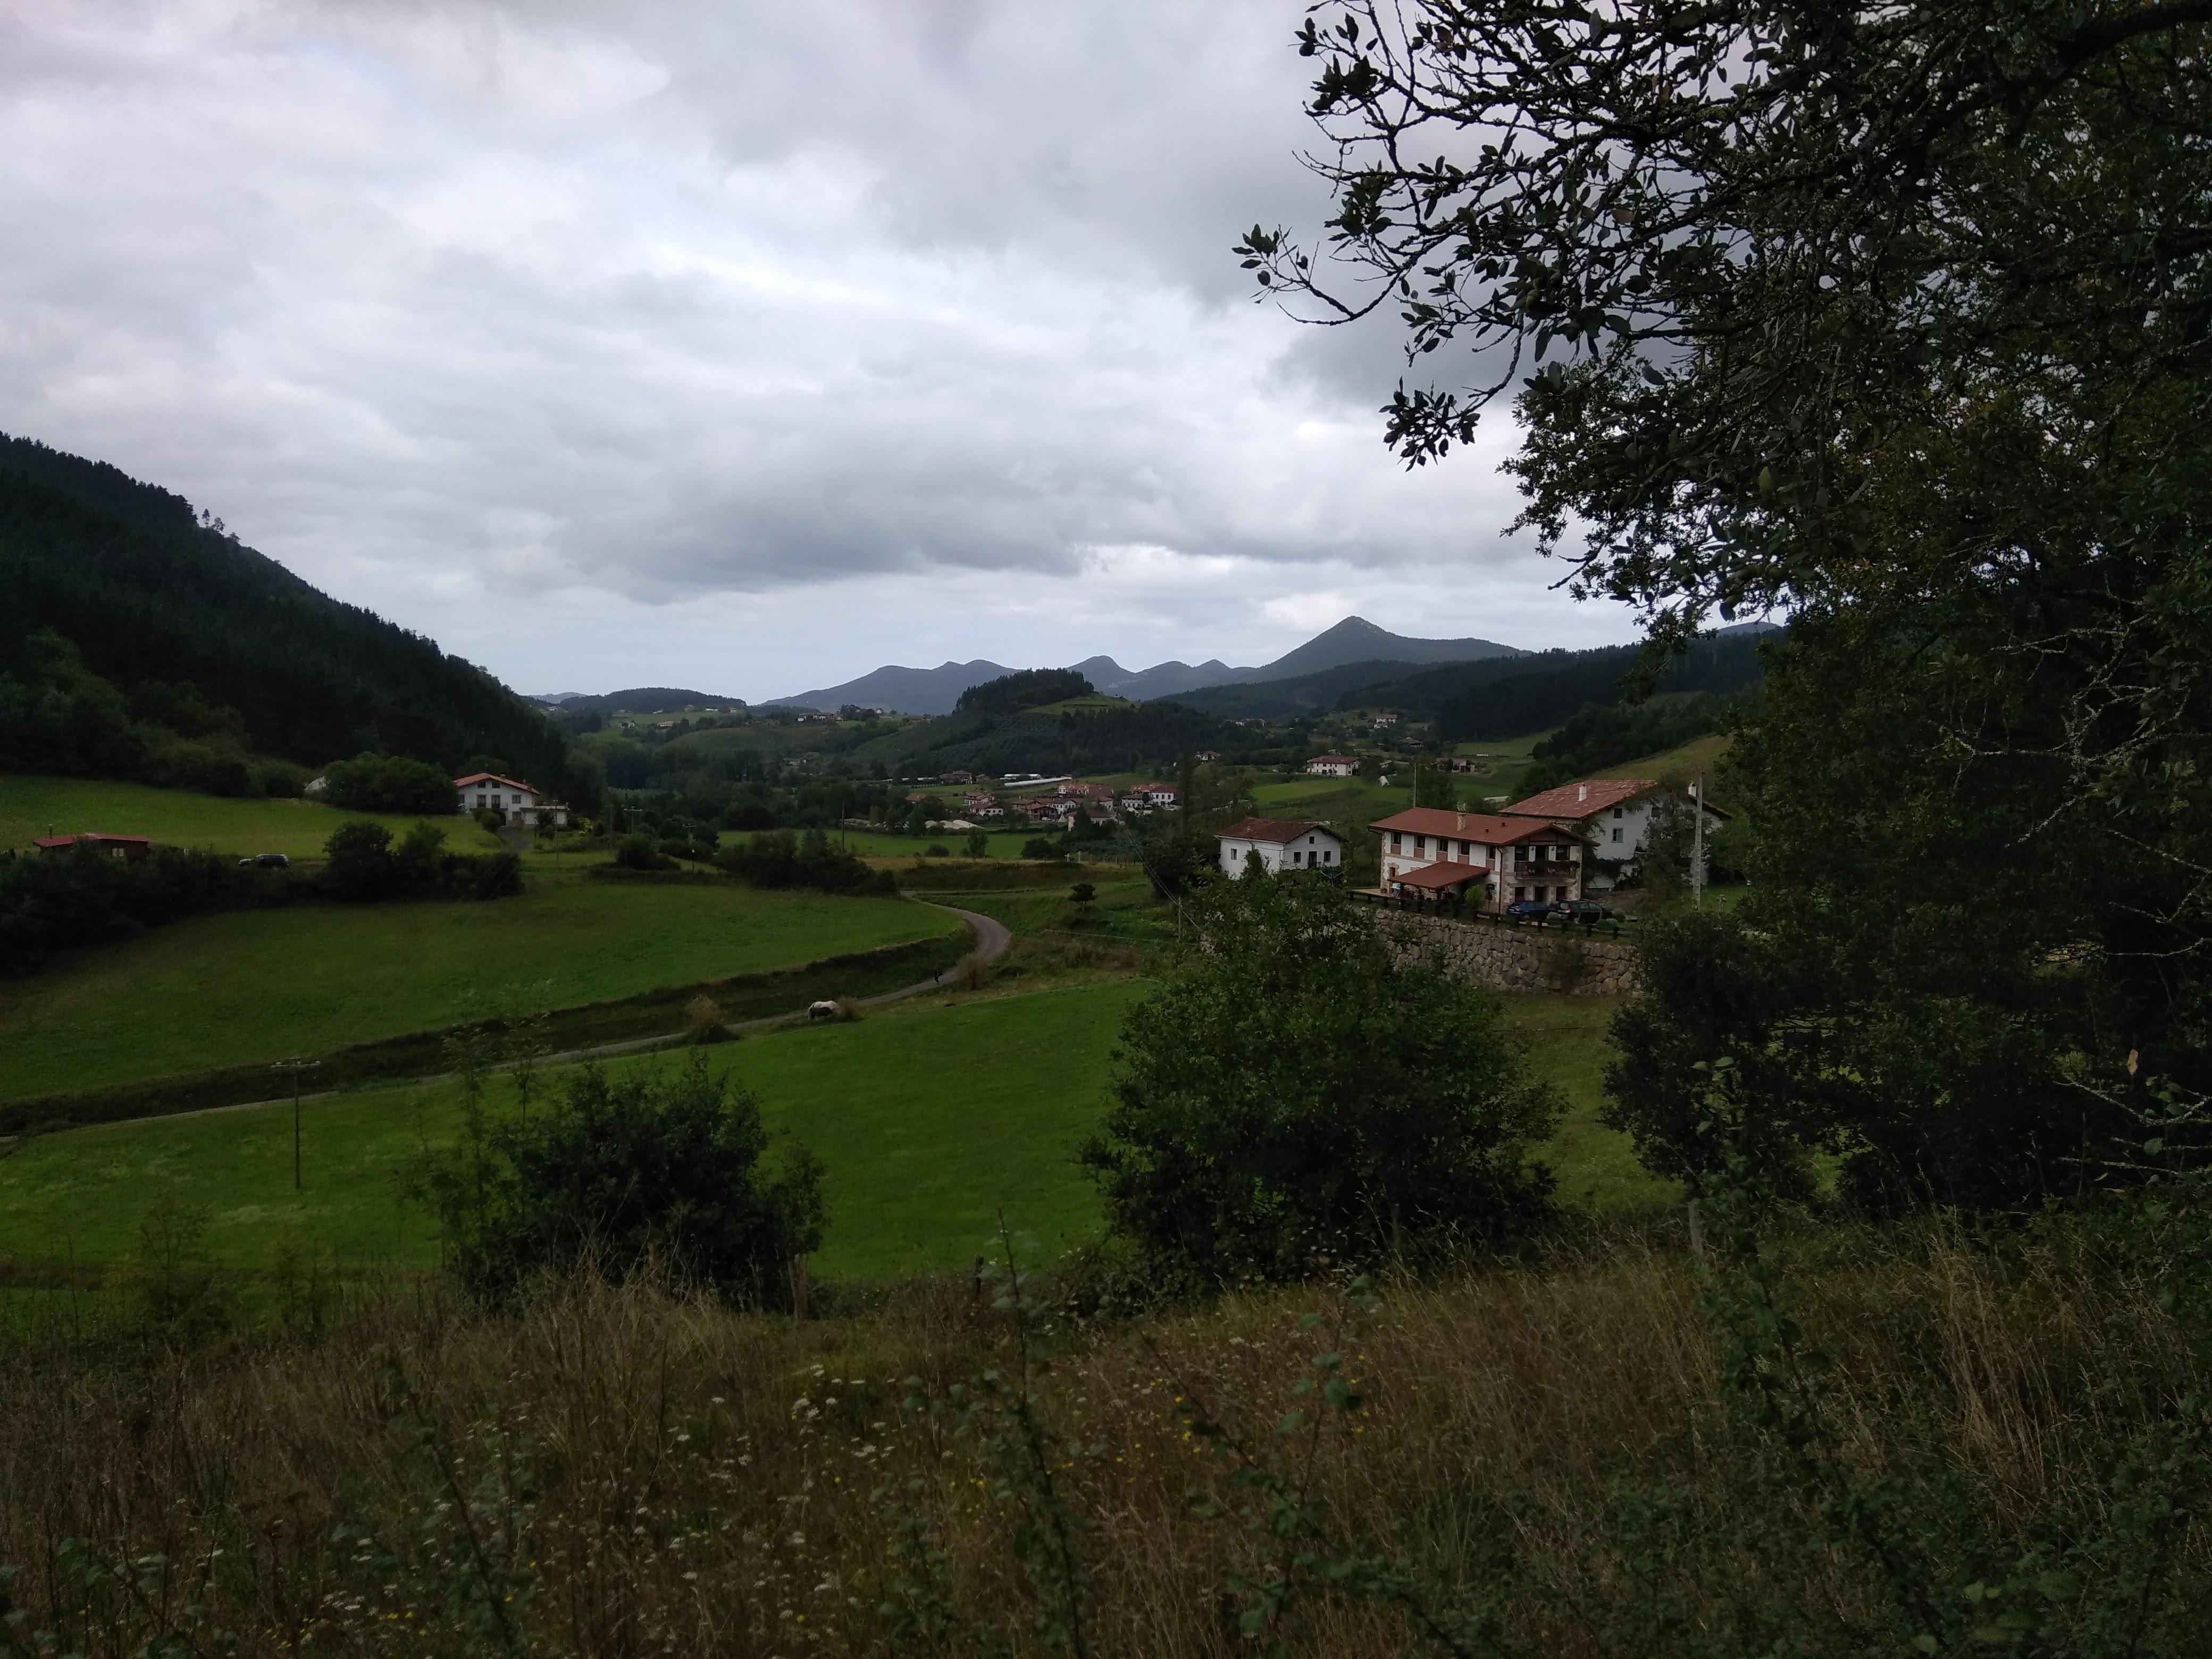 SENDERISMO y Nordic Walking: Munitibar - Arratzu - Gernika, un camino con mucha historia @ Munitibar | Arbácegui y Guerricaiz. Munitíbar o Munditíbar | País Vasco | España